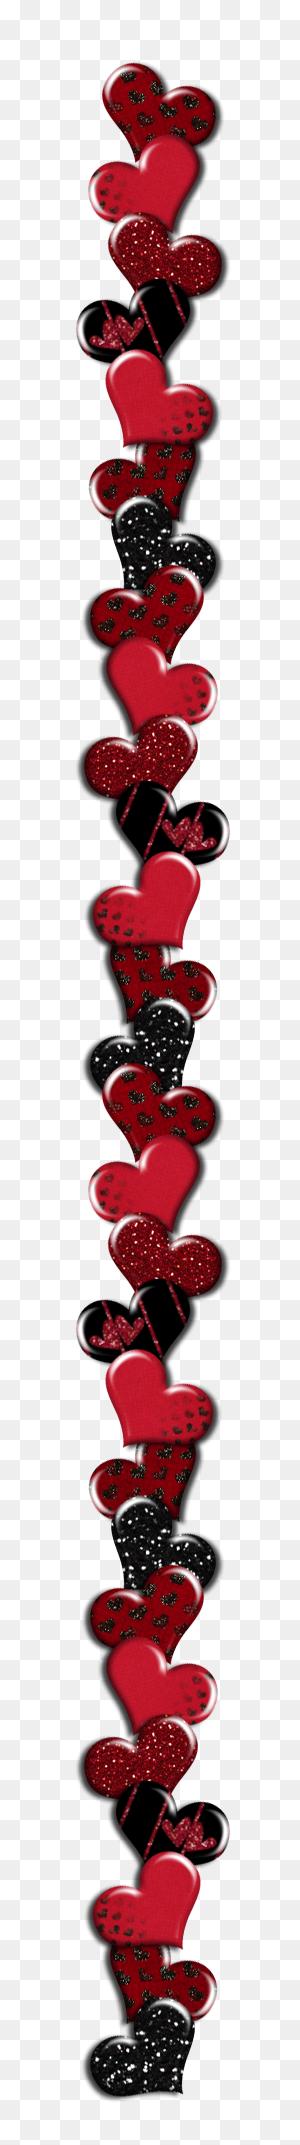 Valentine's Day Heart Border Transparent Png Clip Art Image - Valentine Border Clip Art